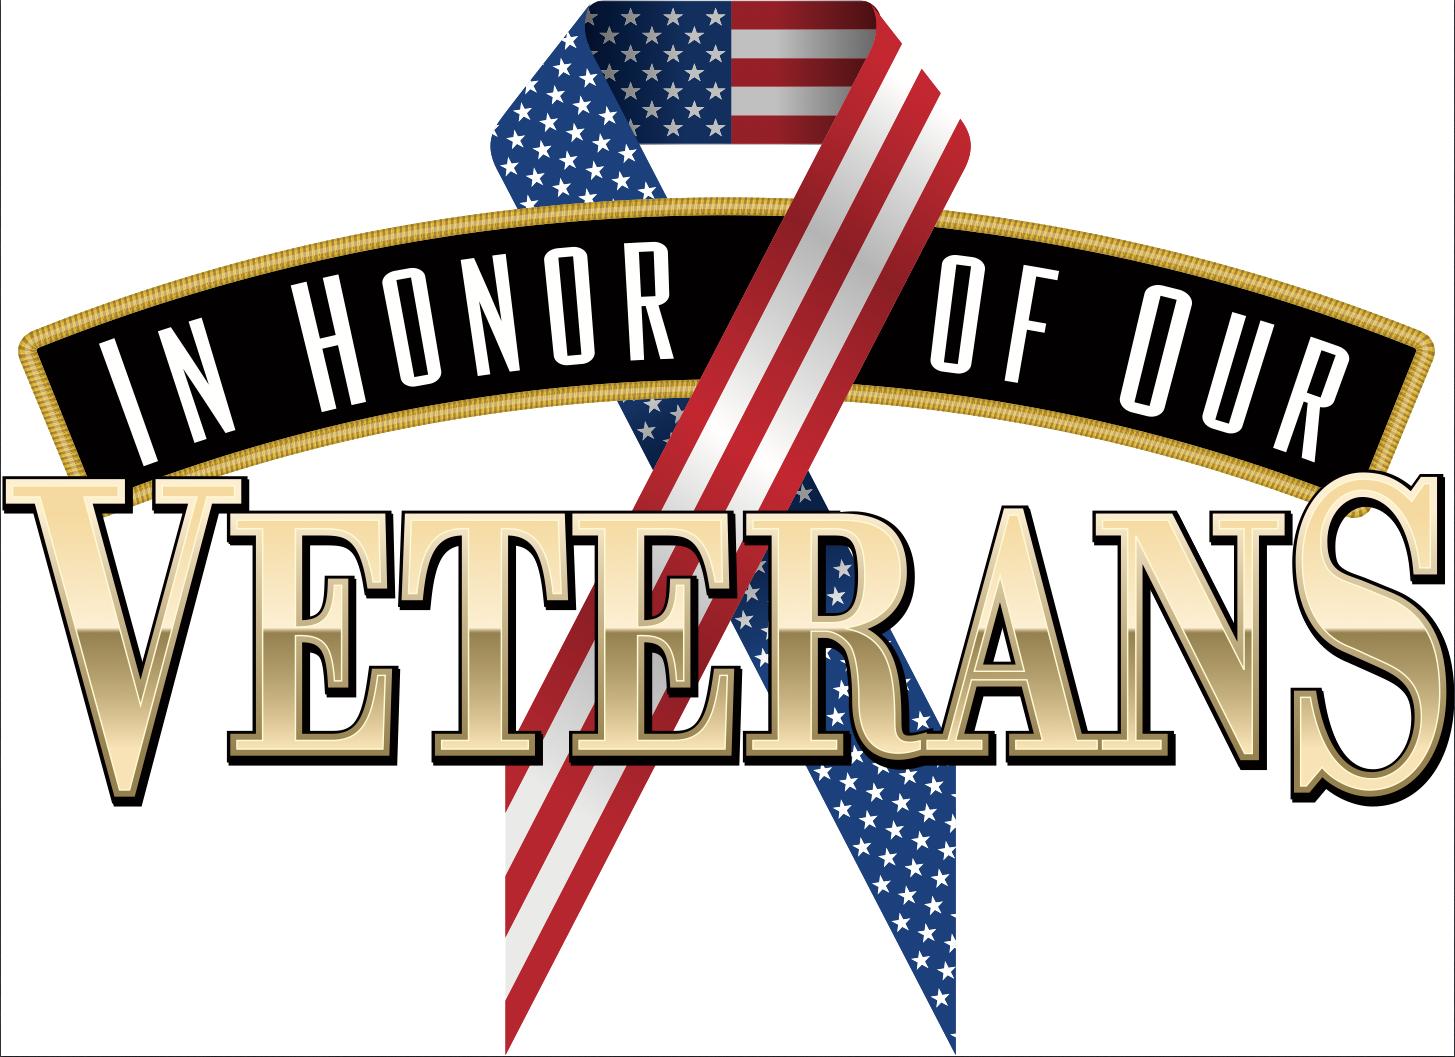 Happy Veterans Day Images 2019 - Happy Veterans Day Images, Pictures,  Photos, Pics, HD Wallpa… | Veterans day quotes, Veterans day images, Happy veterans  day quotes